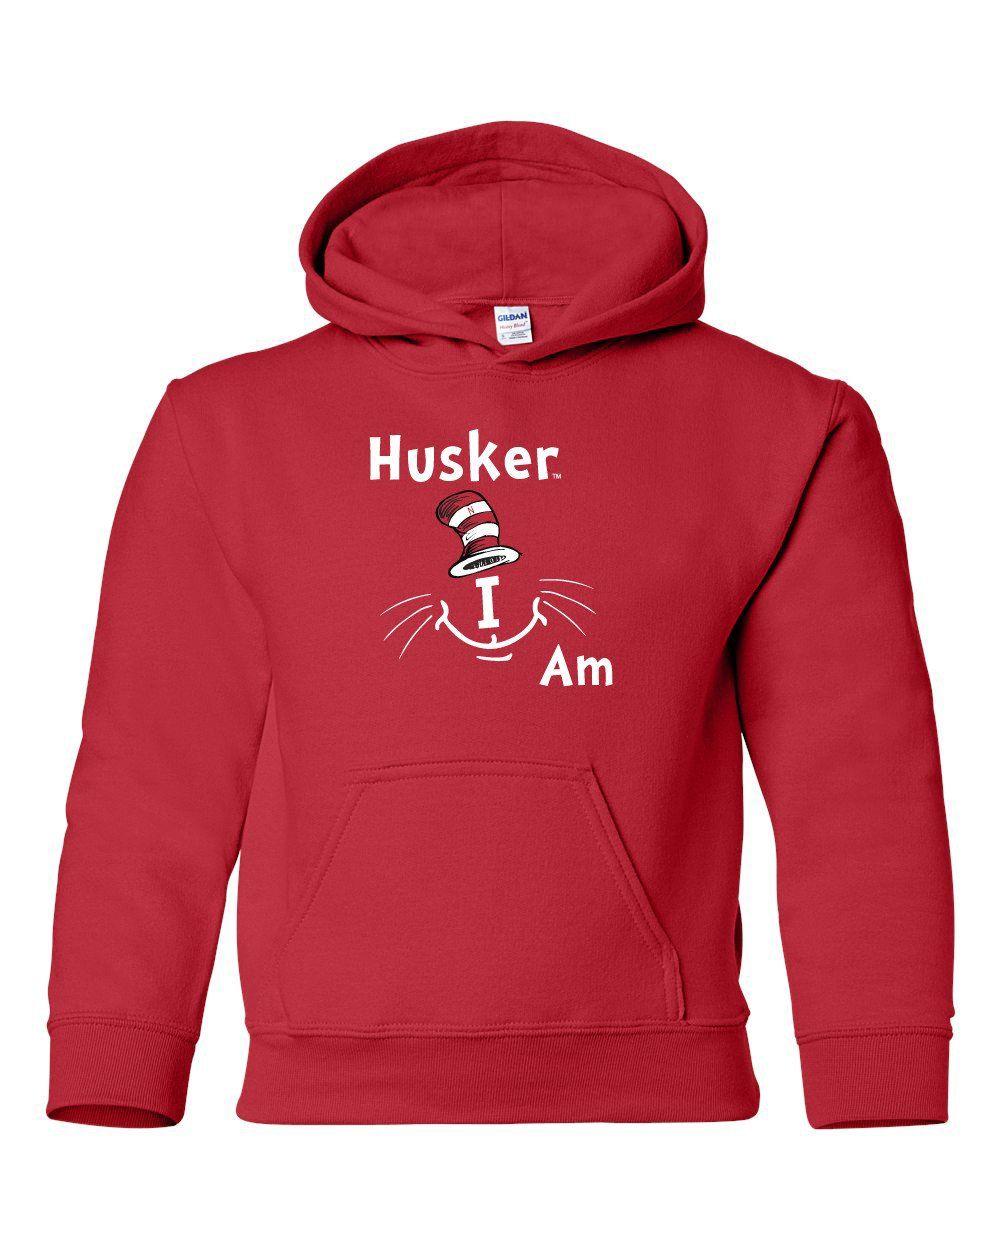 Nebraska Cornhuskers Sweatshirts Sweatshirt Shirt Hoodies [ 1250 x 1000 Pixel ]